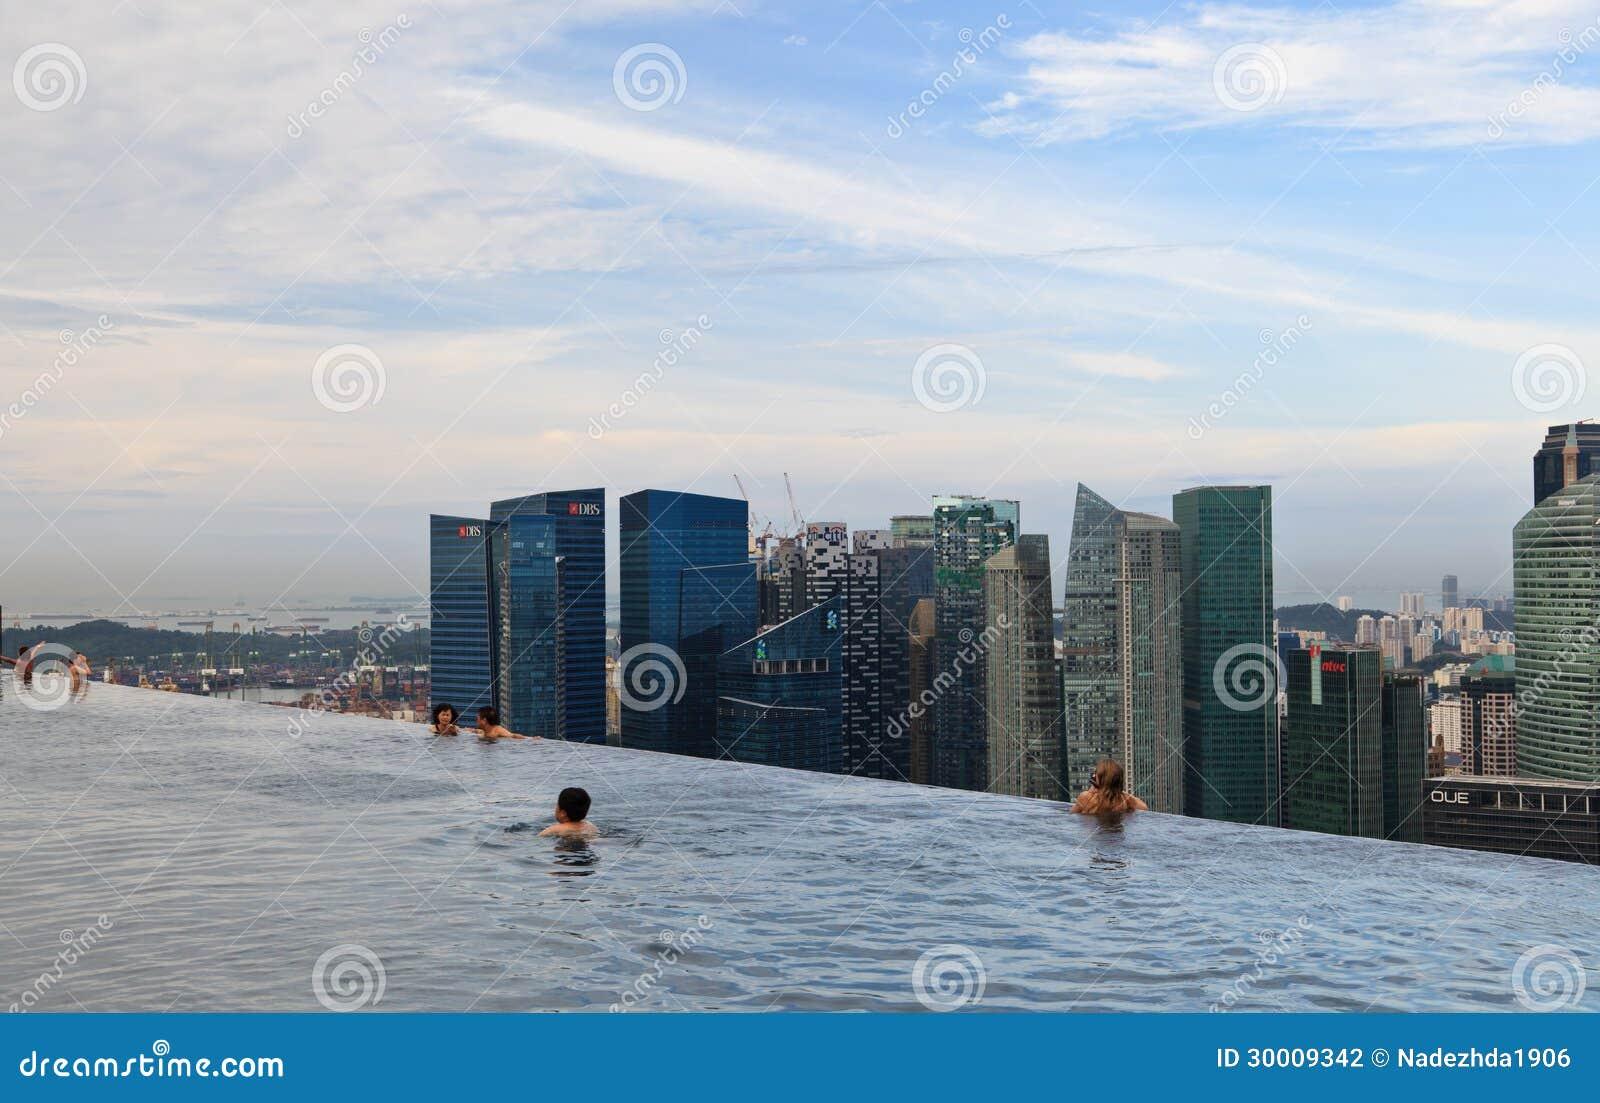 Marina Bay Sands Pool Editorial Photography Image 30009342